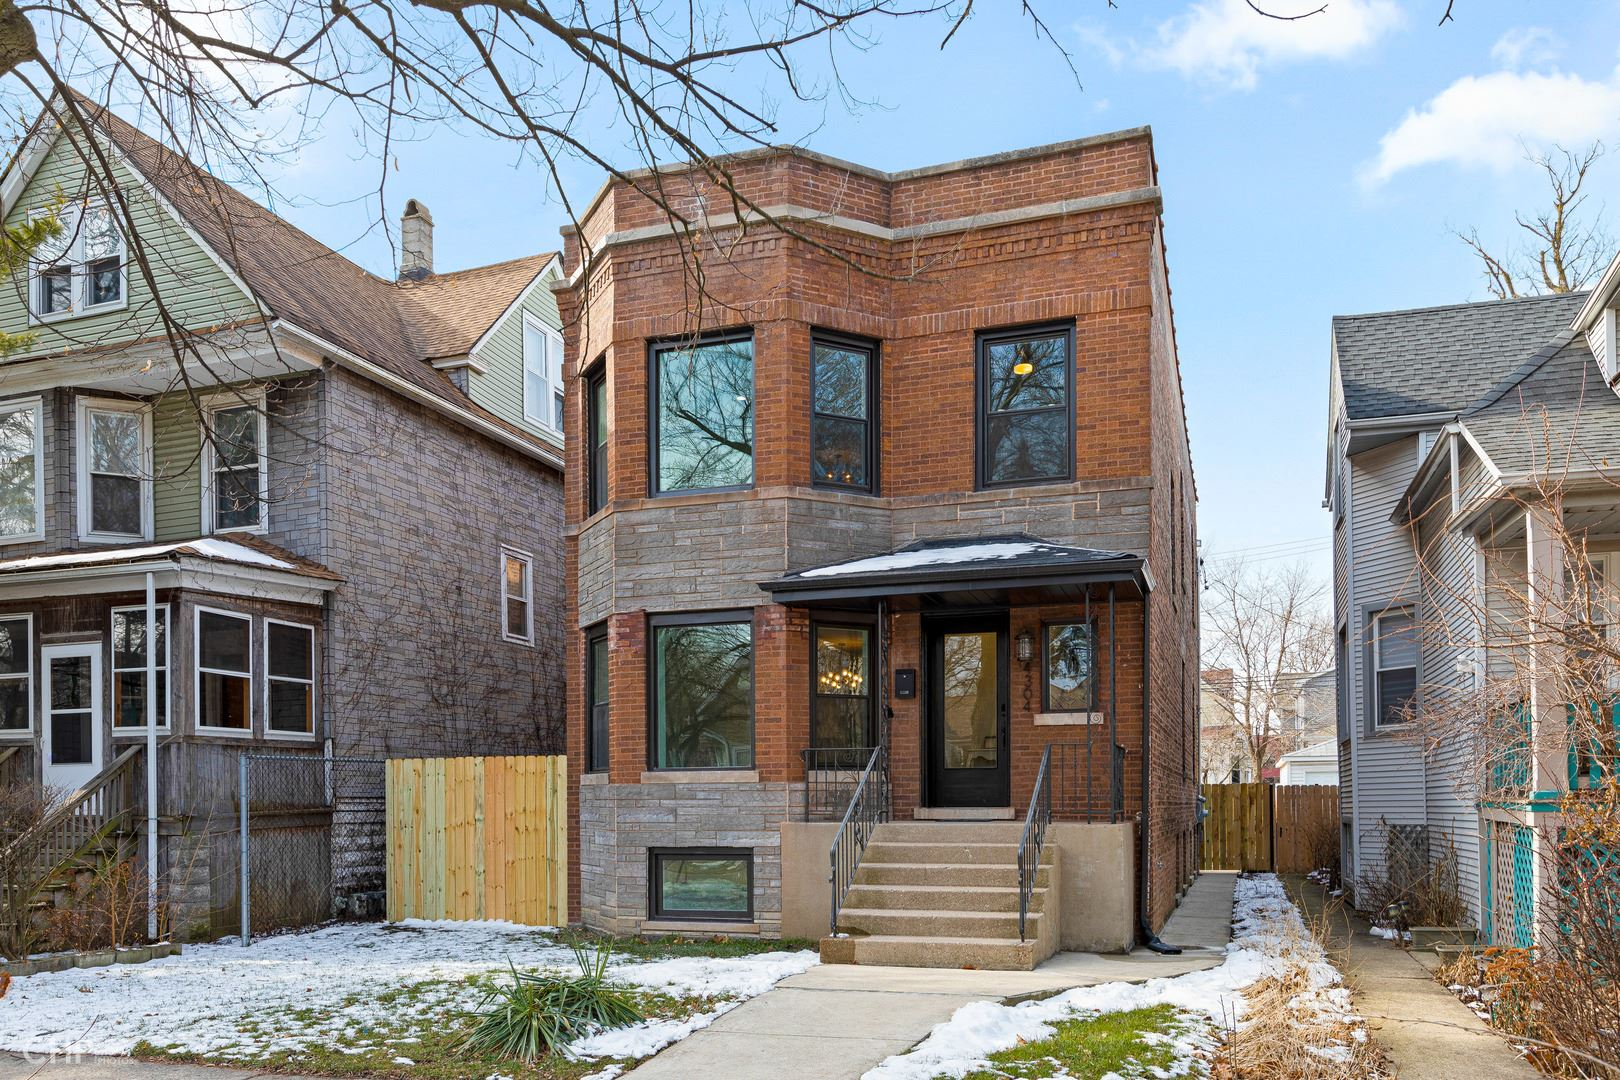 4304 N Hamlin Avenue, Chicago, IL 60618 - #: 10715711